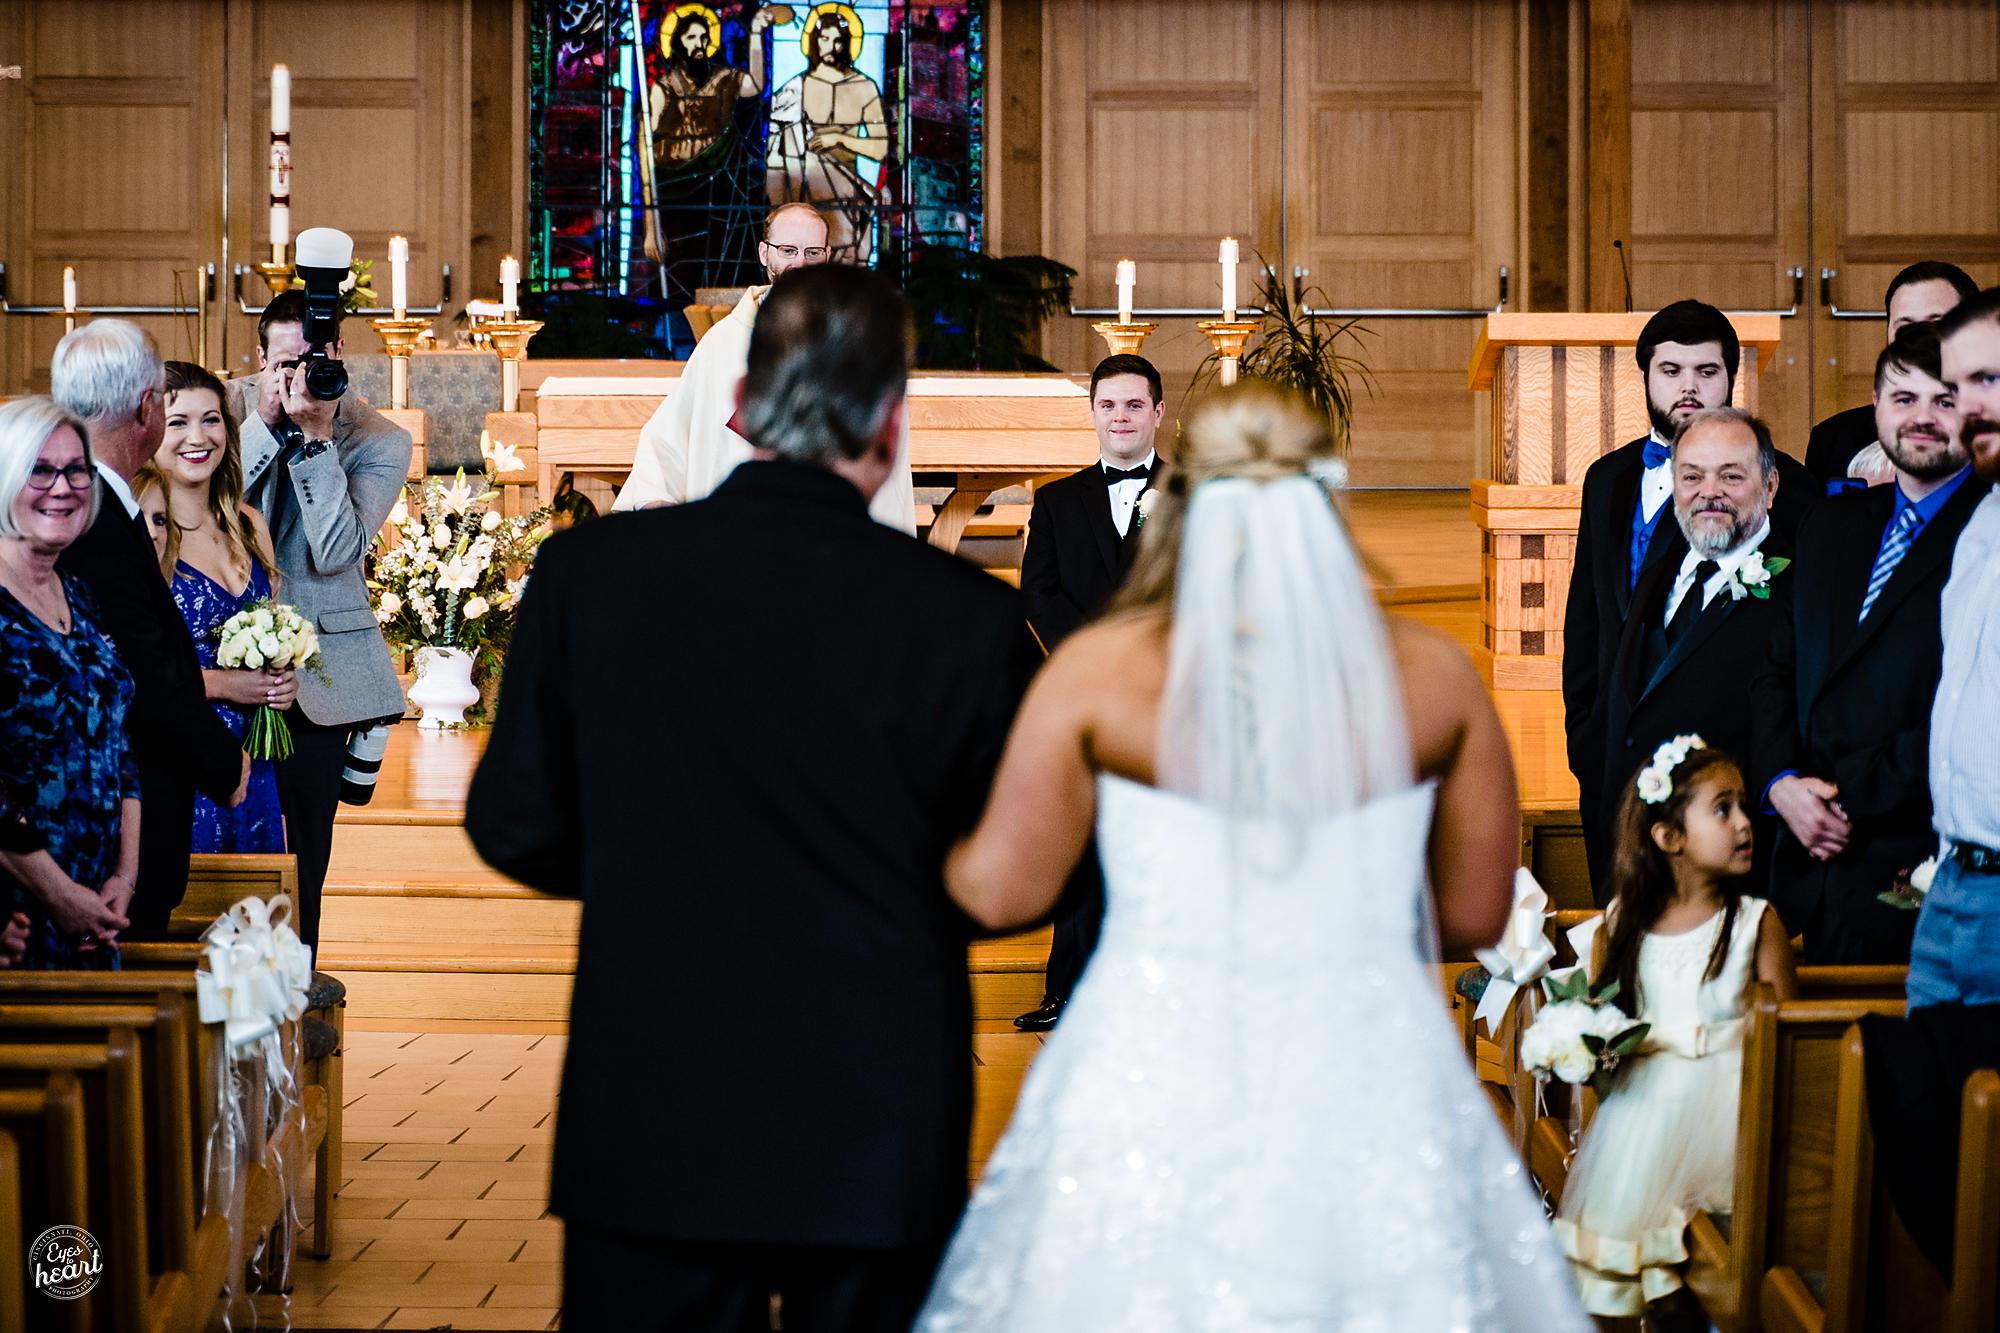 St-Susanna-Church-Mason-OH-Wedding-Photographer-11.jpg